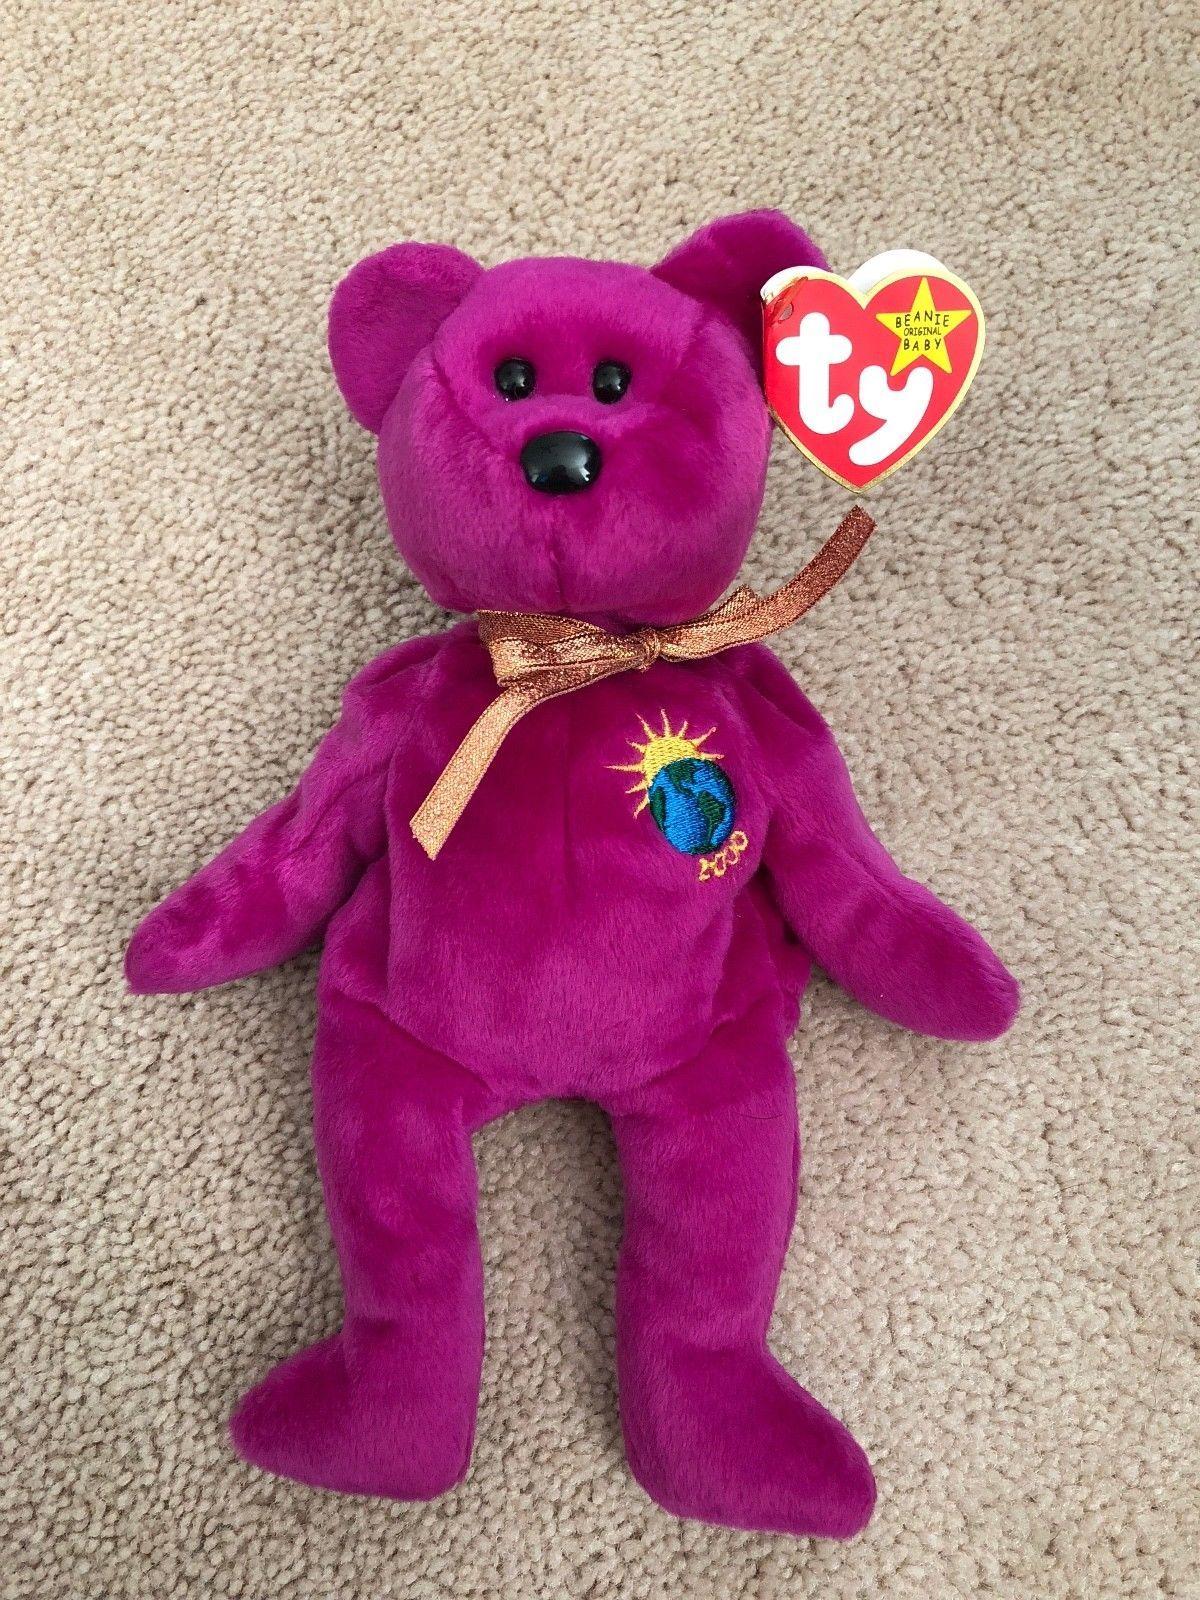 31de12873fd EXTREMELY RARE - Errors - TY Beanie Baby Millennium Millenium Bear - RETIRED